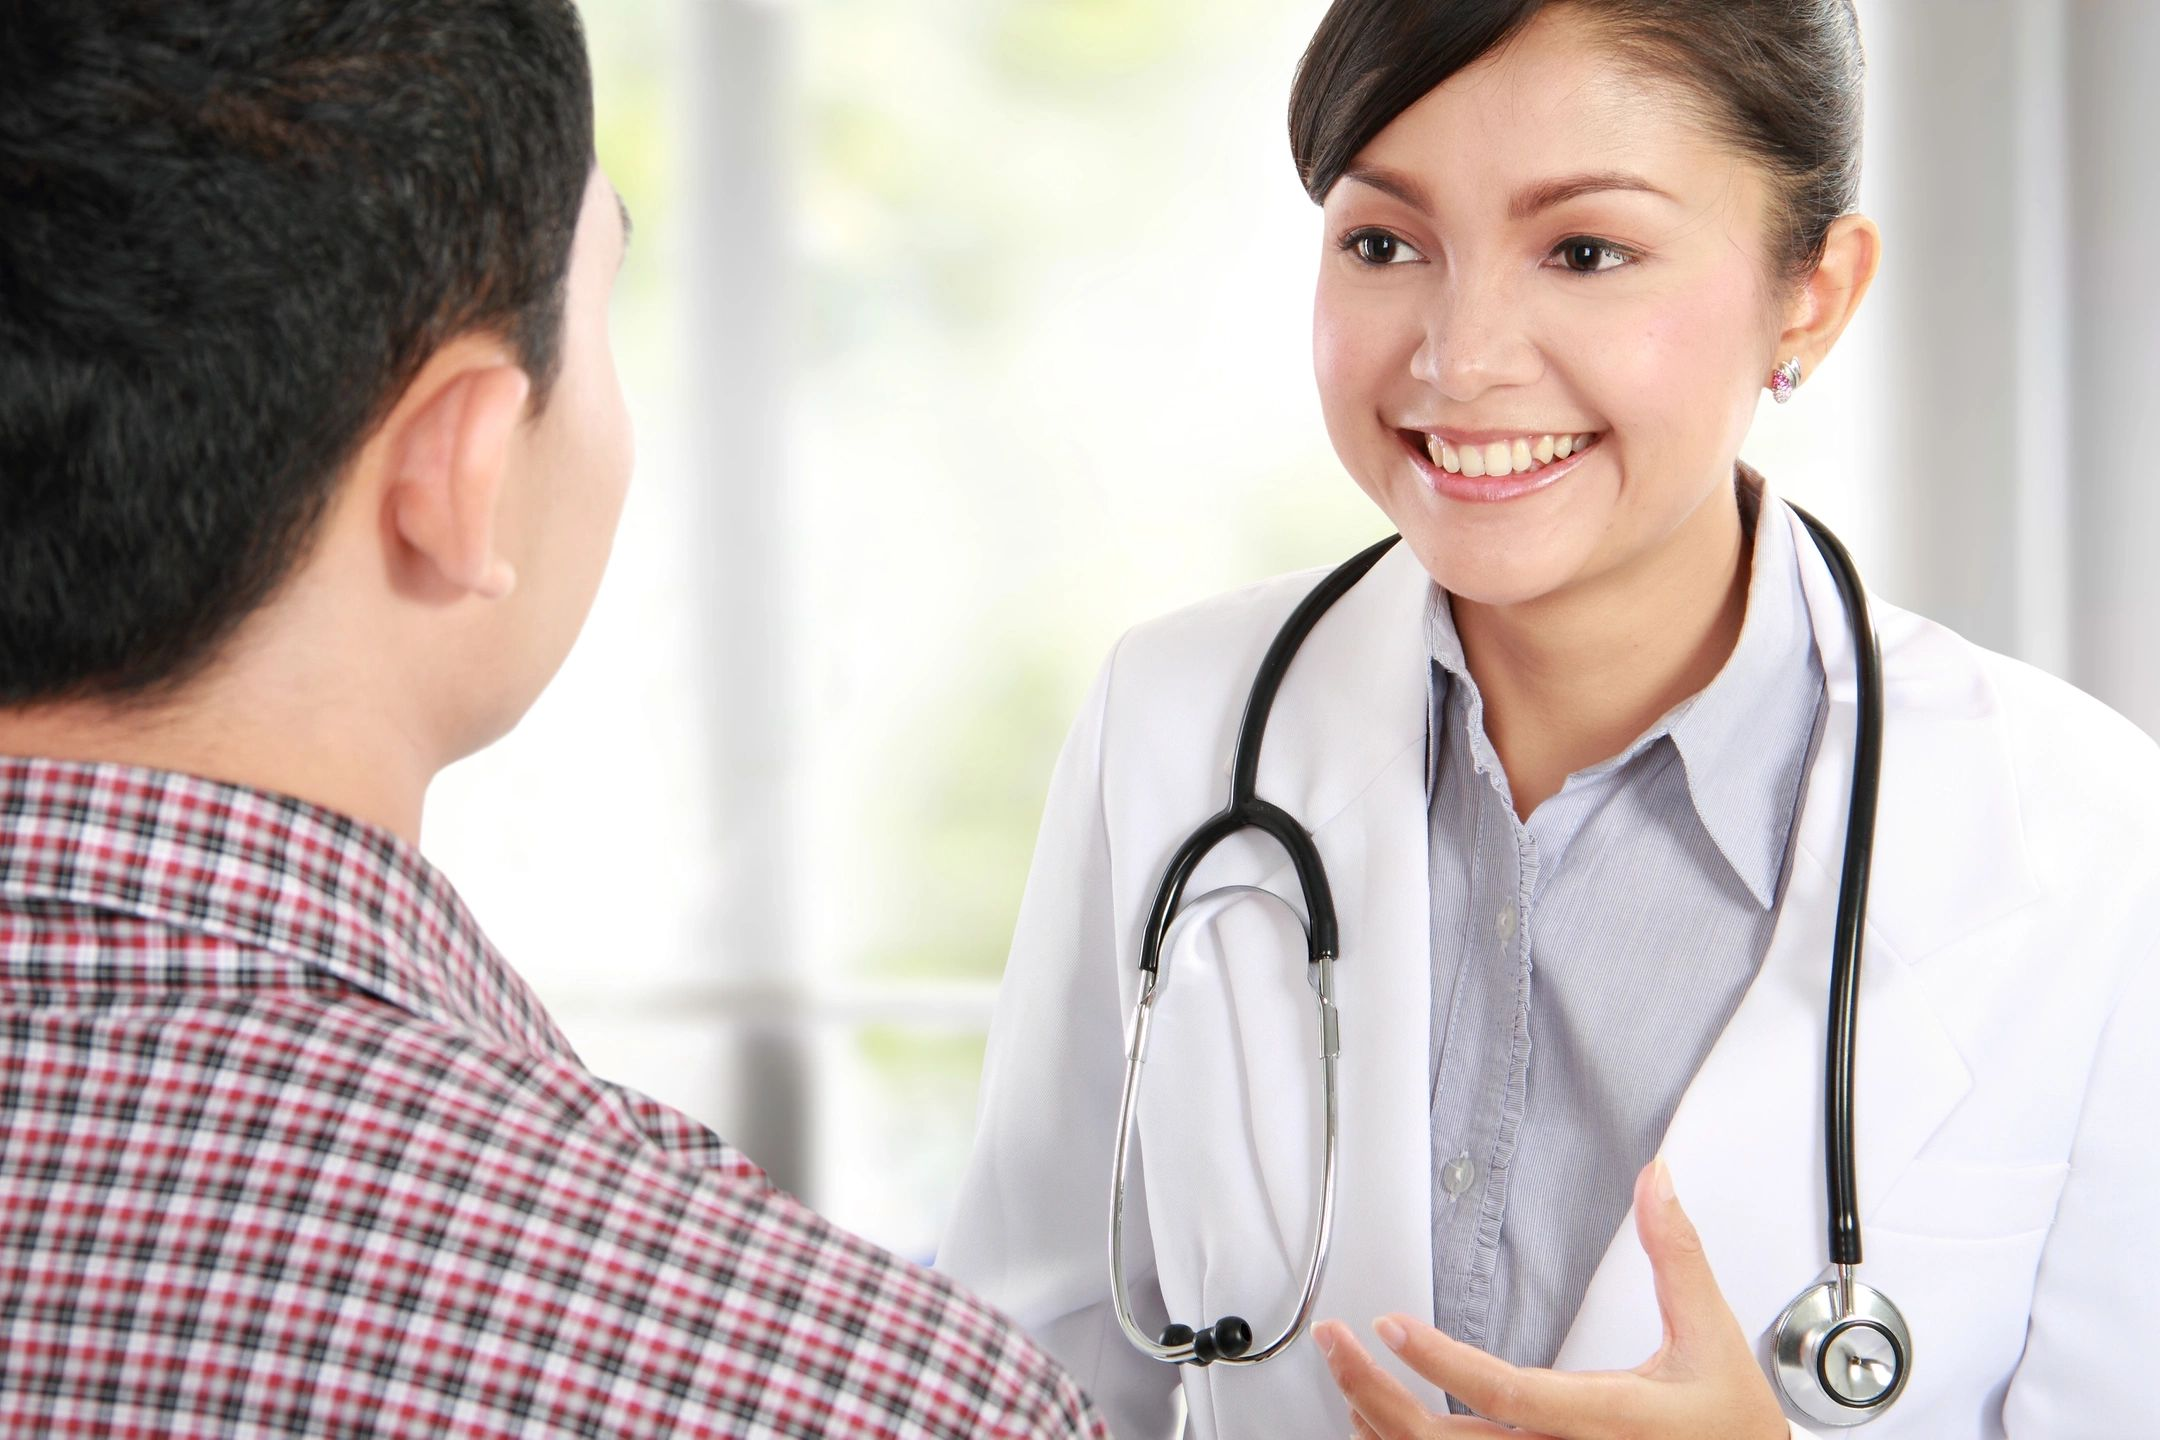 Medicine/Hospitalist